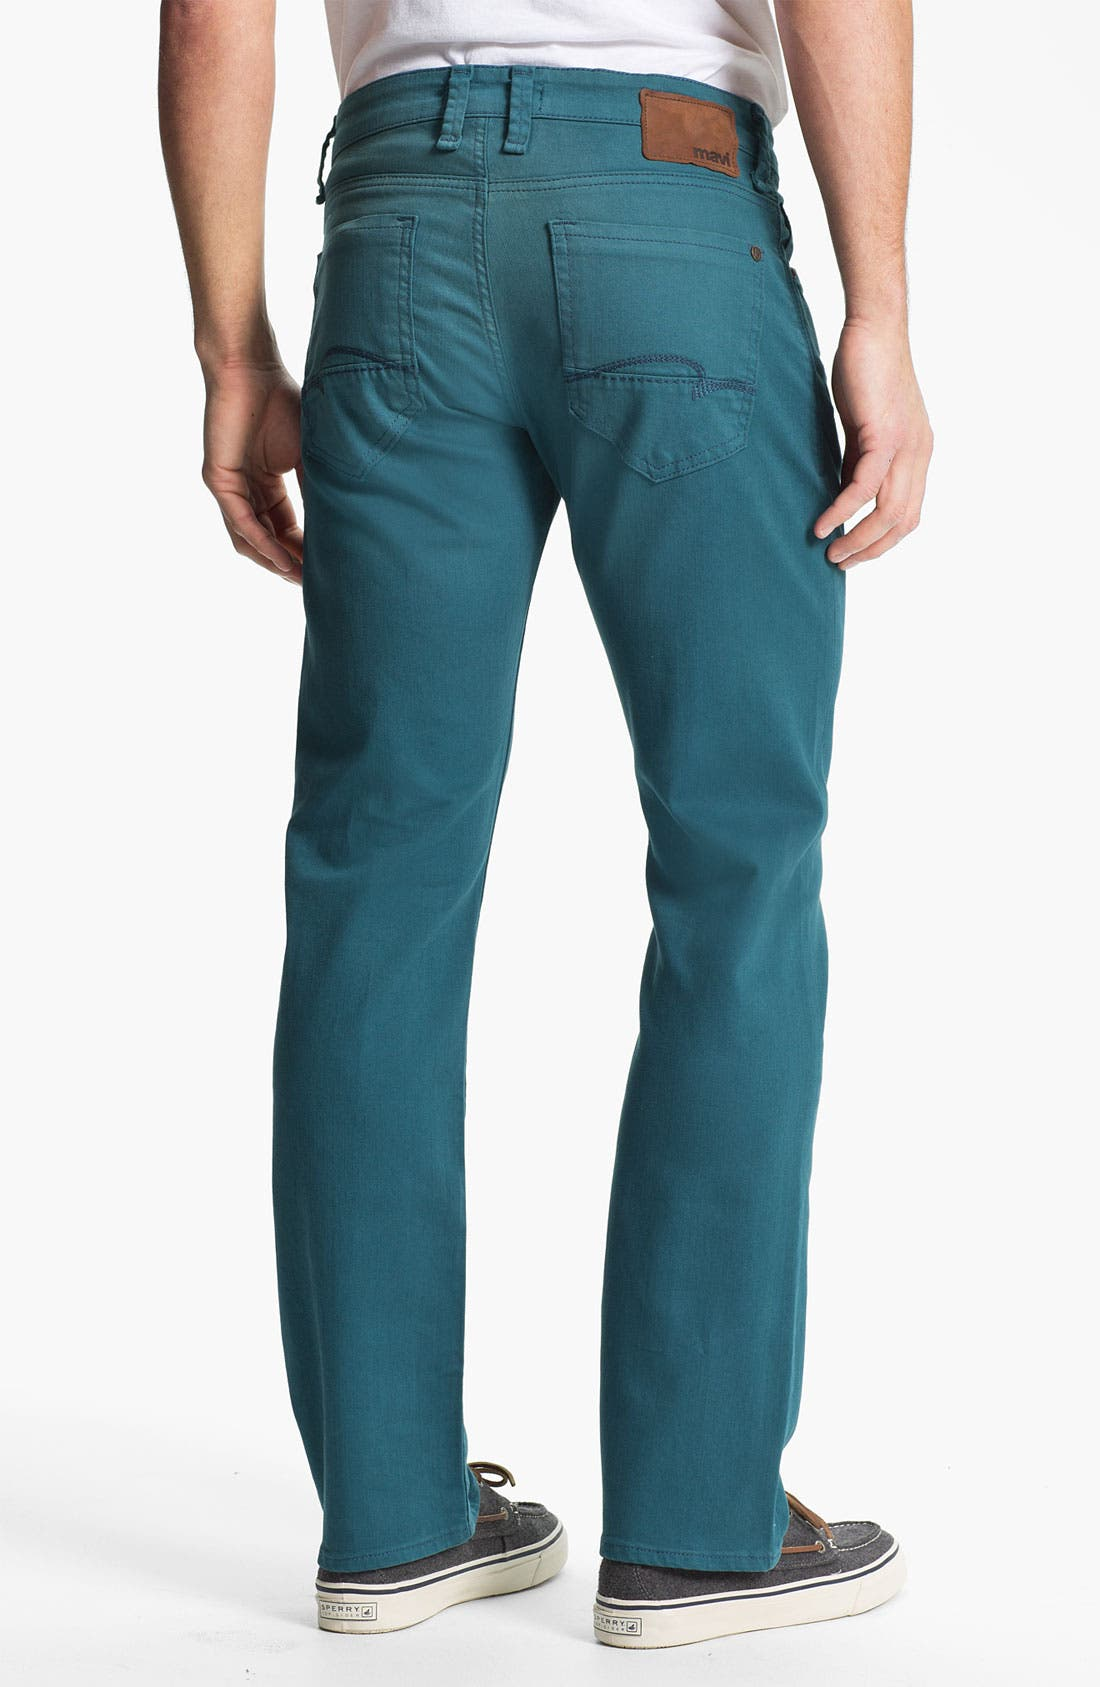 Alternate Image 1 Selected - Mavi Jeans 'Zach' Straight Leg Jeans (Teal)